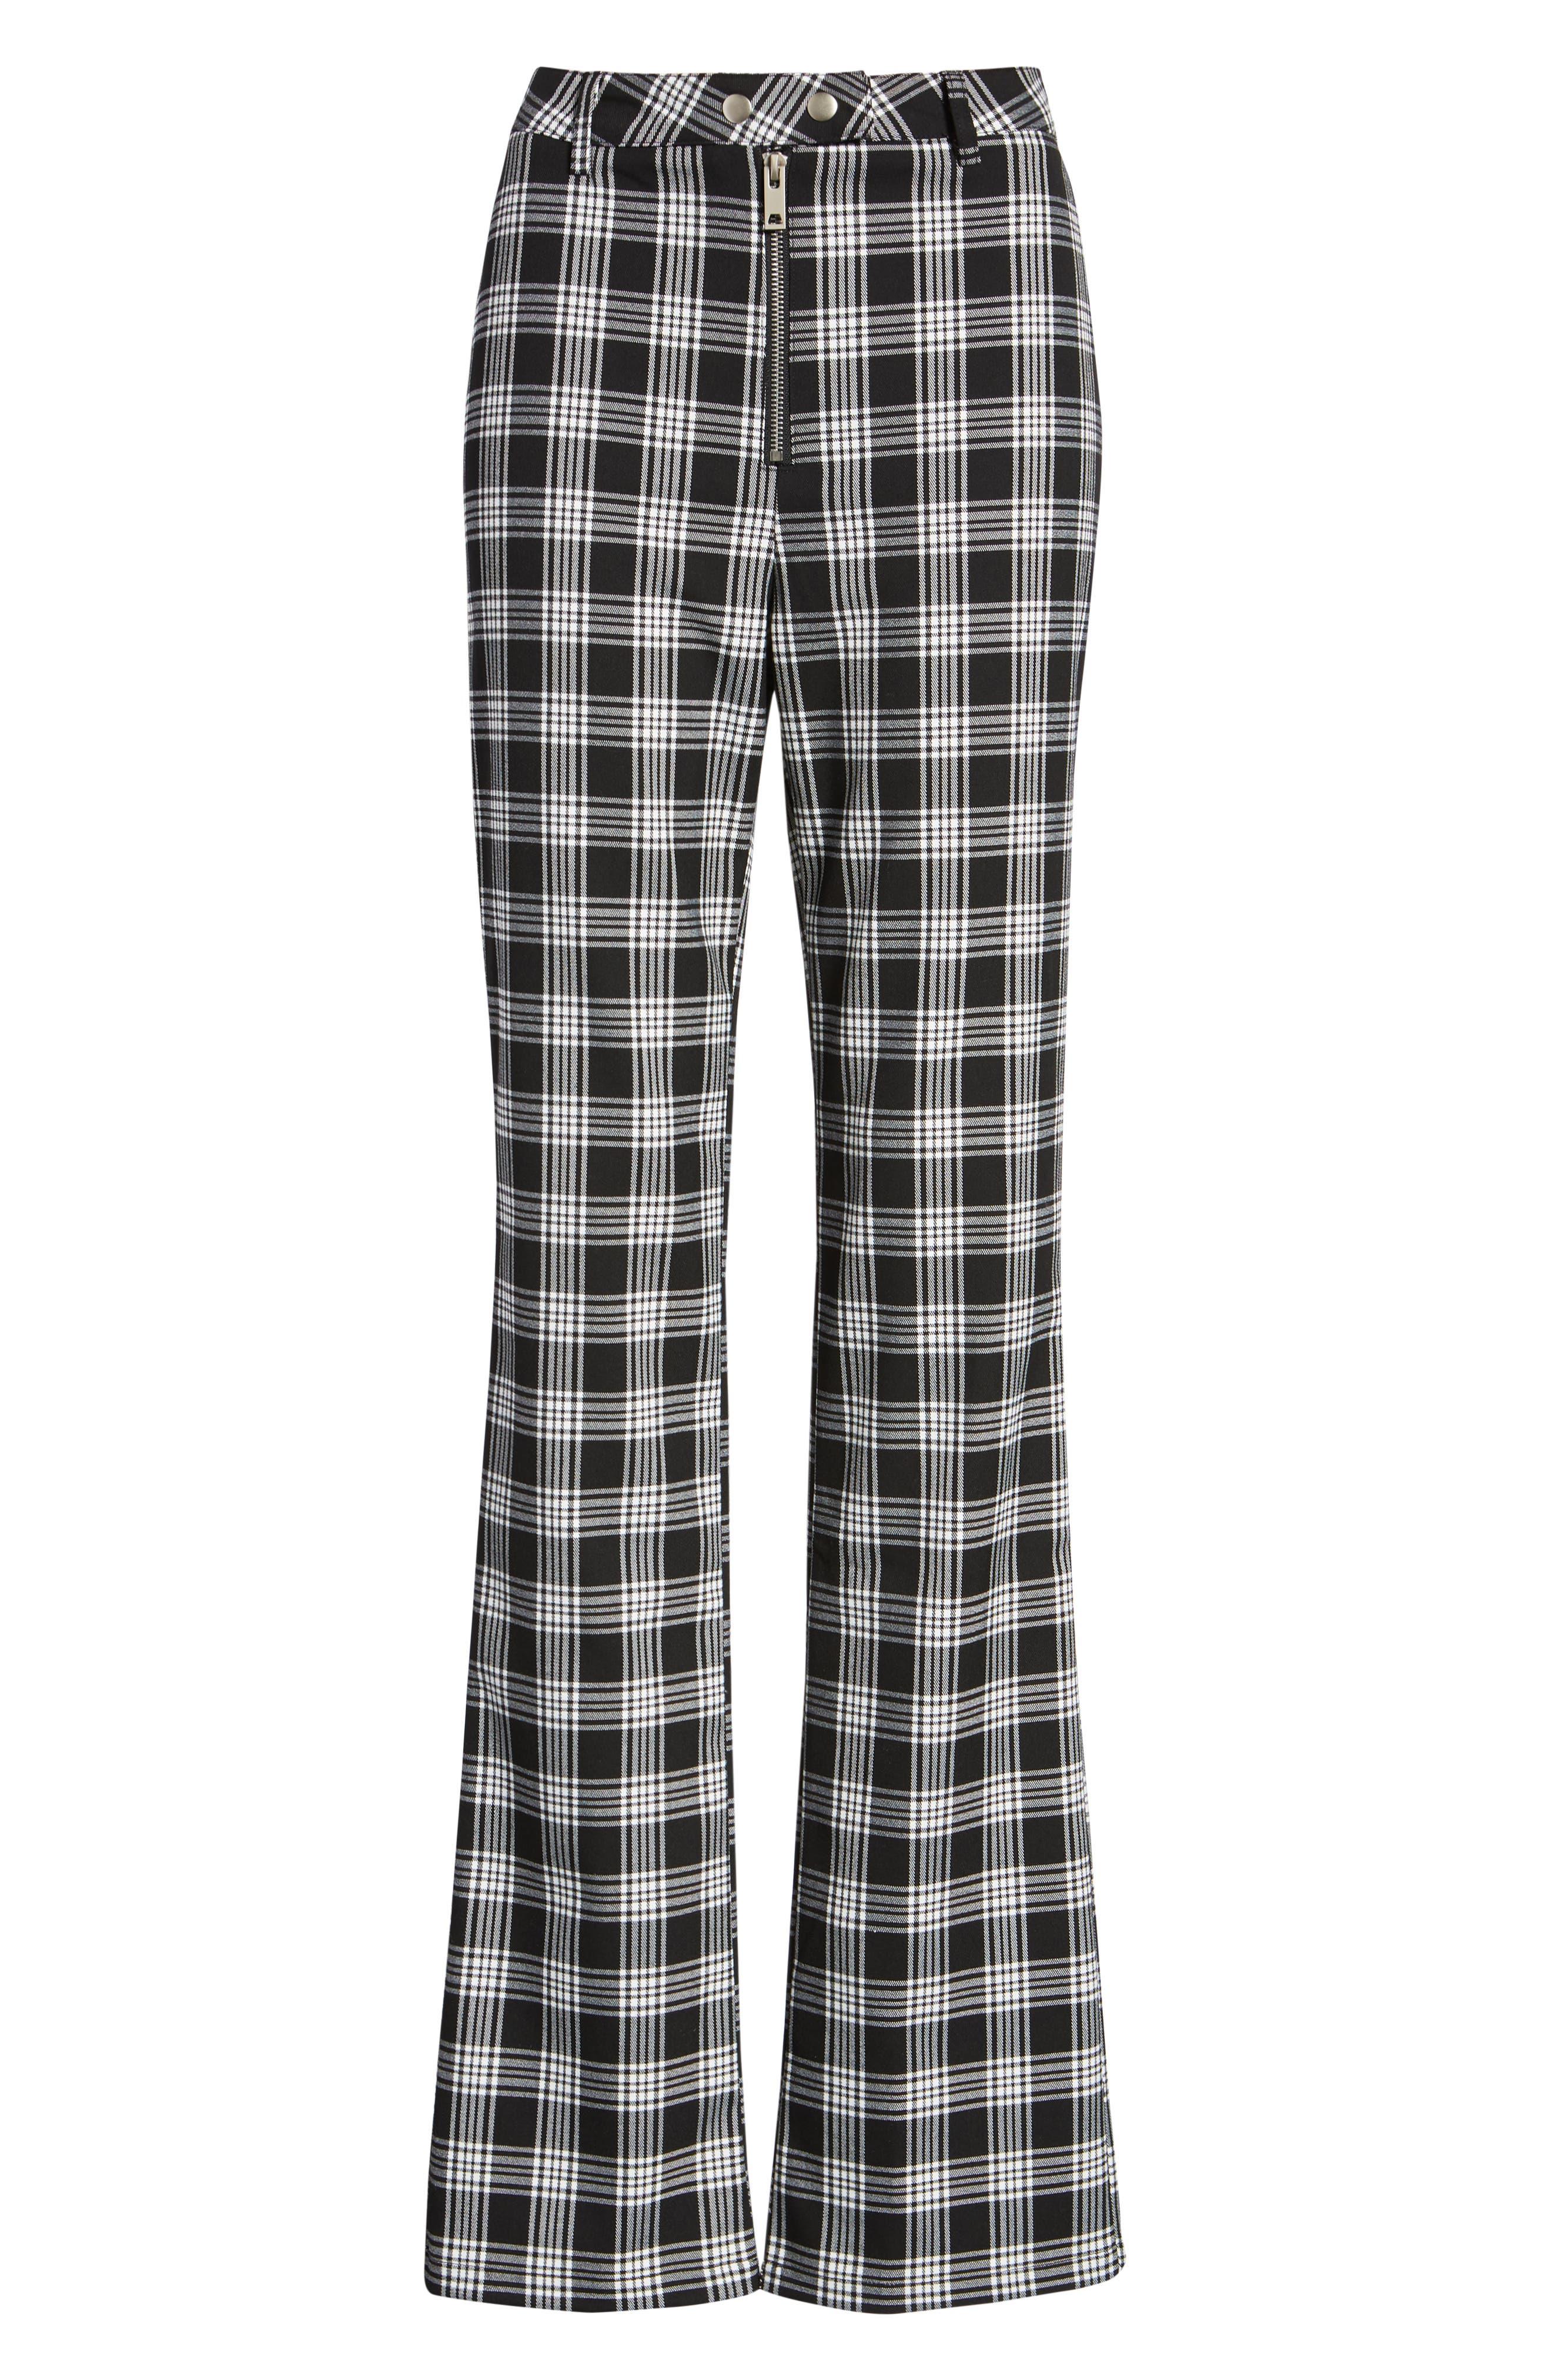 Slater Pants,                             Alternate thumbnail 6, color,                             002